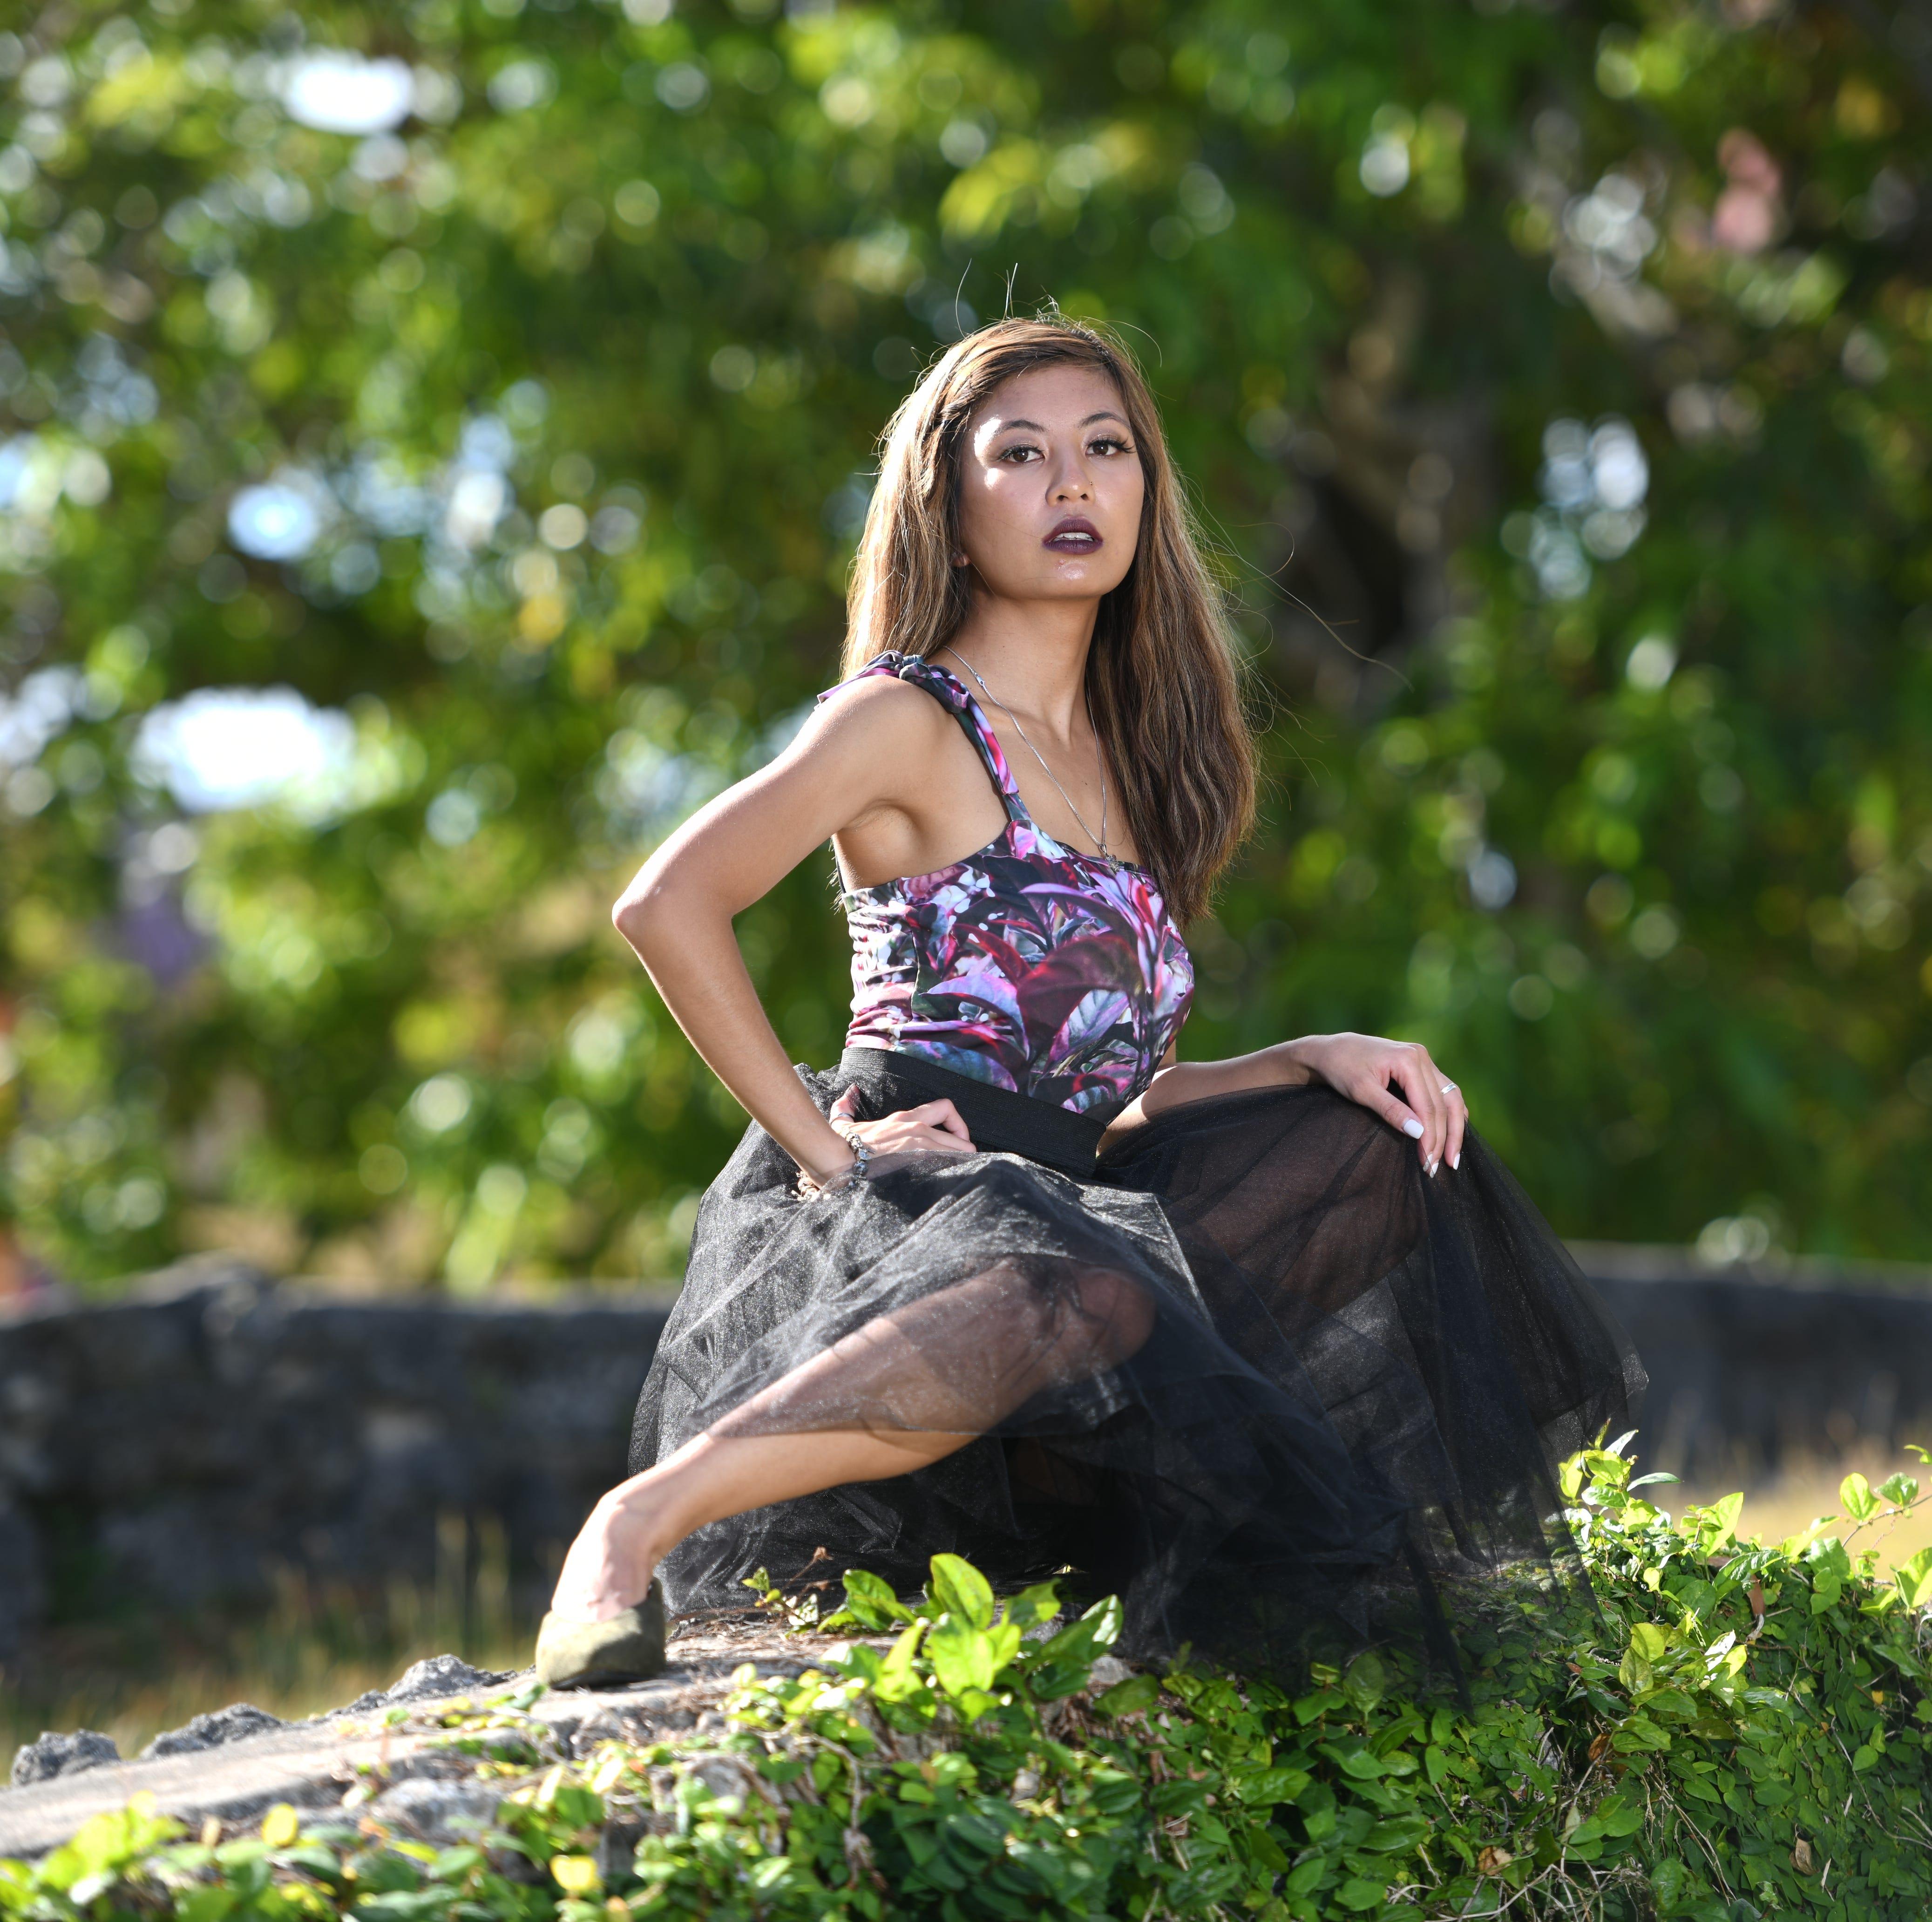 Leslie Sanga builds womenswear brand Gacha slowly, purposefully